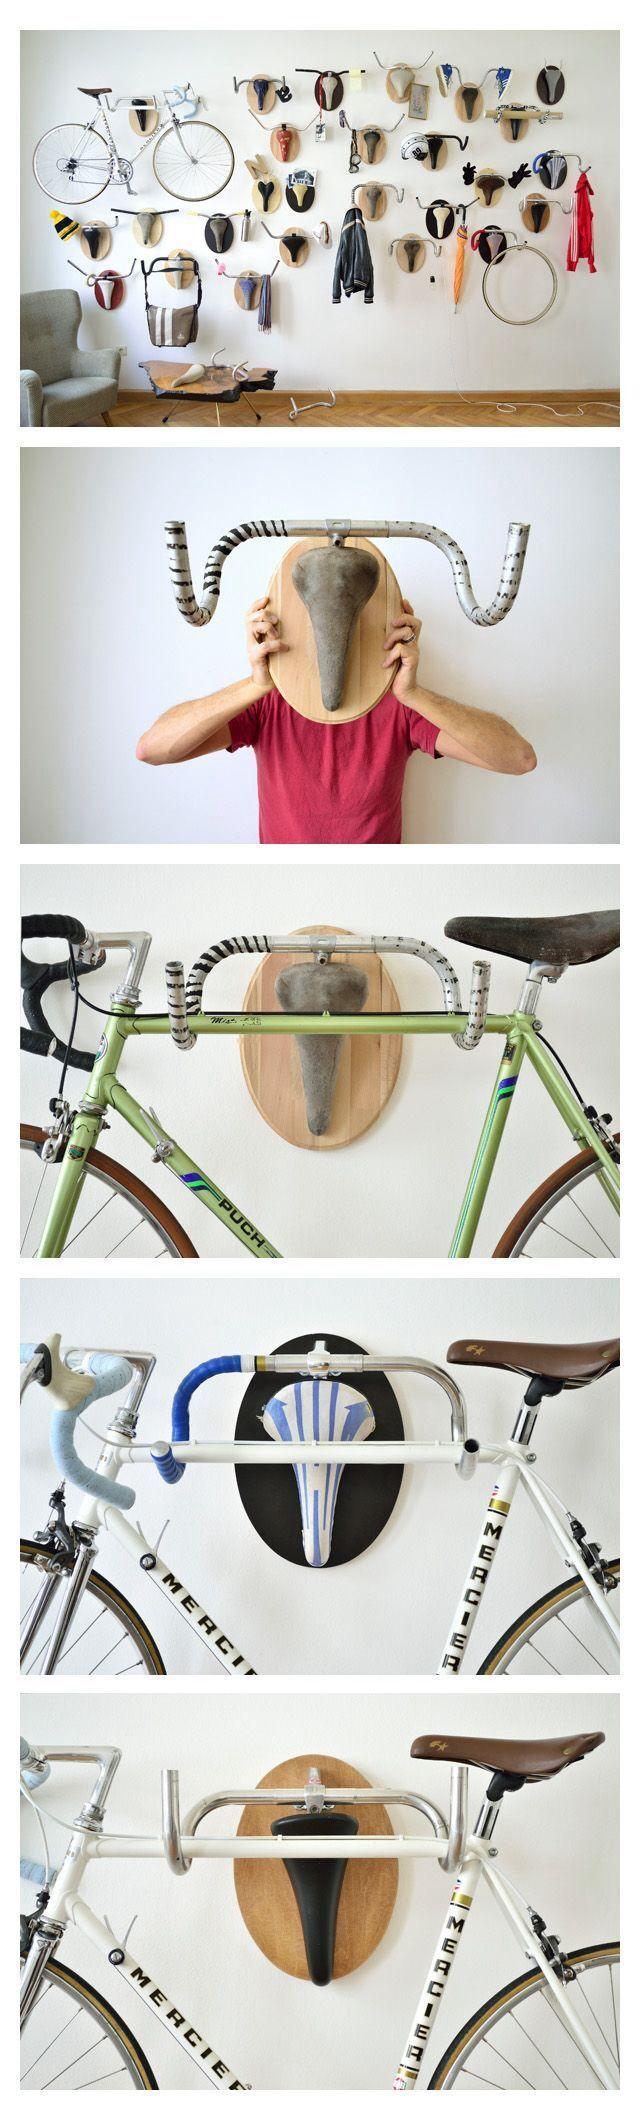 Image result for saddle bike handlebar skull